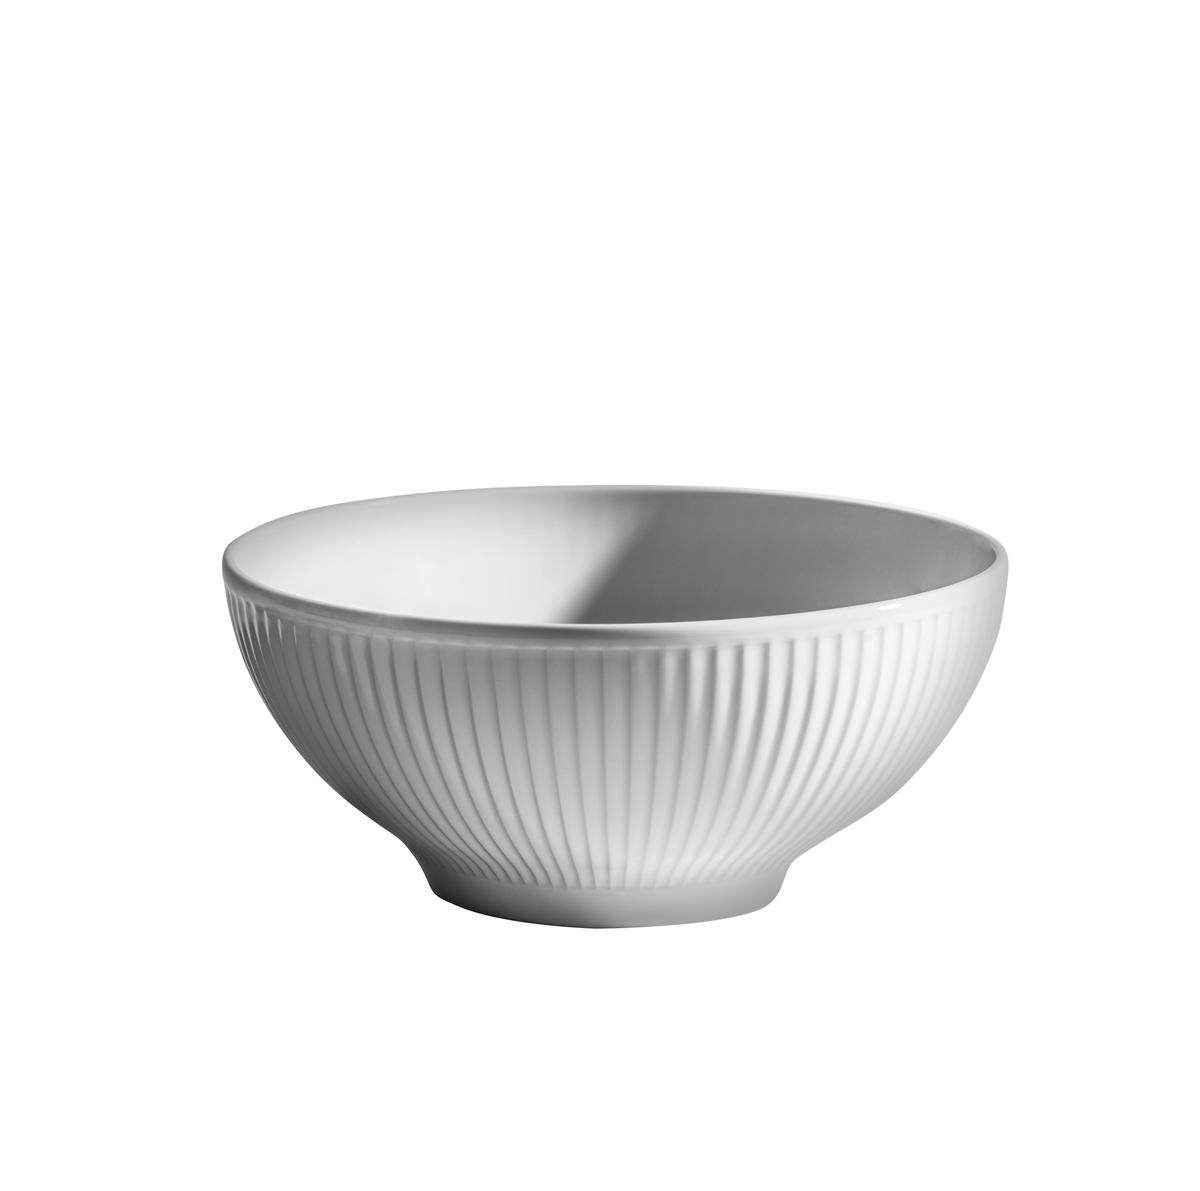 Bol rond blanc porcelaine Ø 18 cm Plisse Pillivuyt